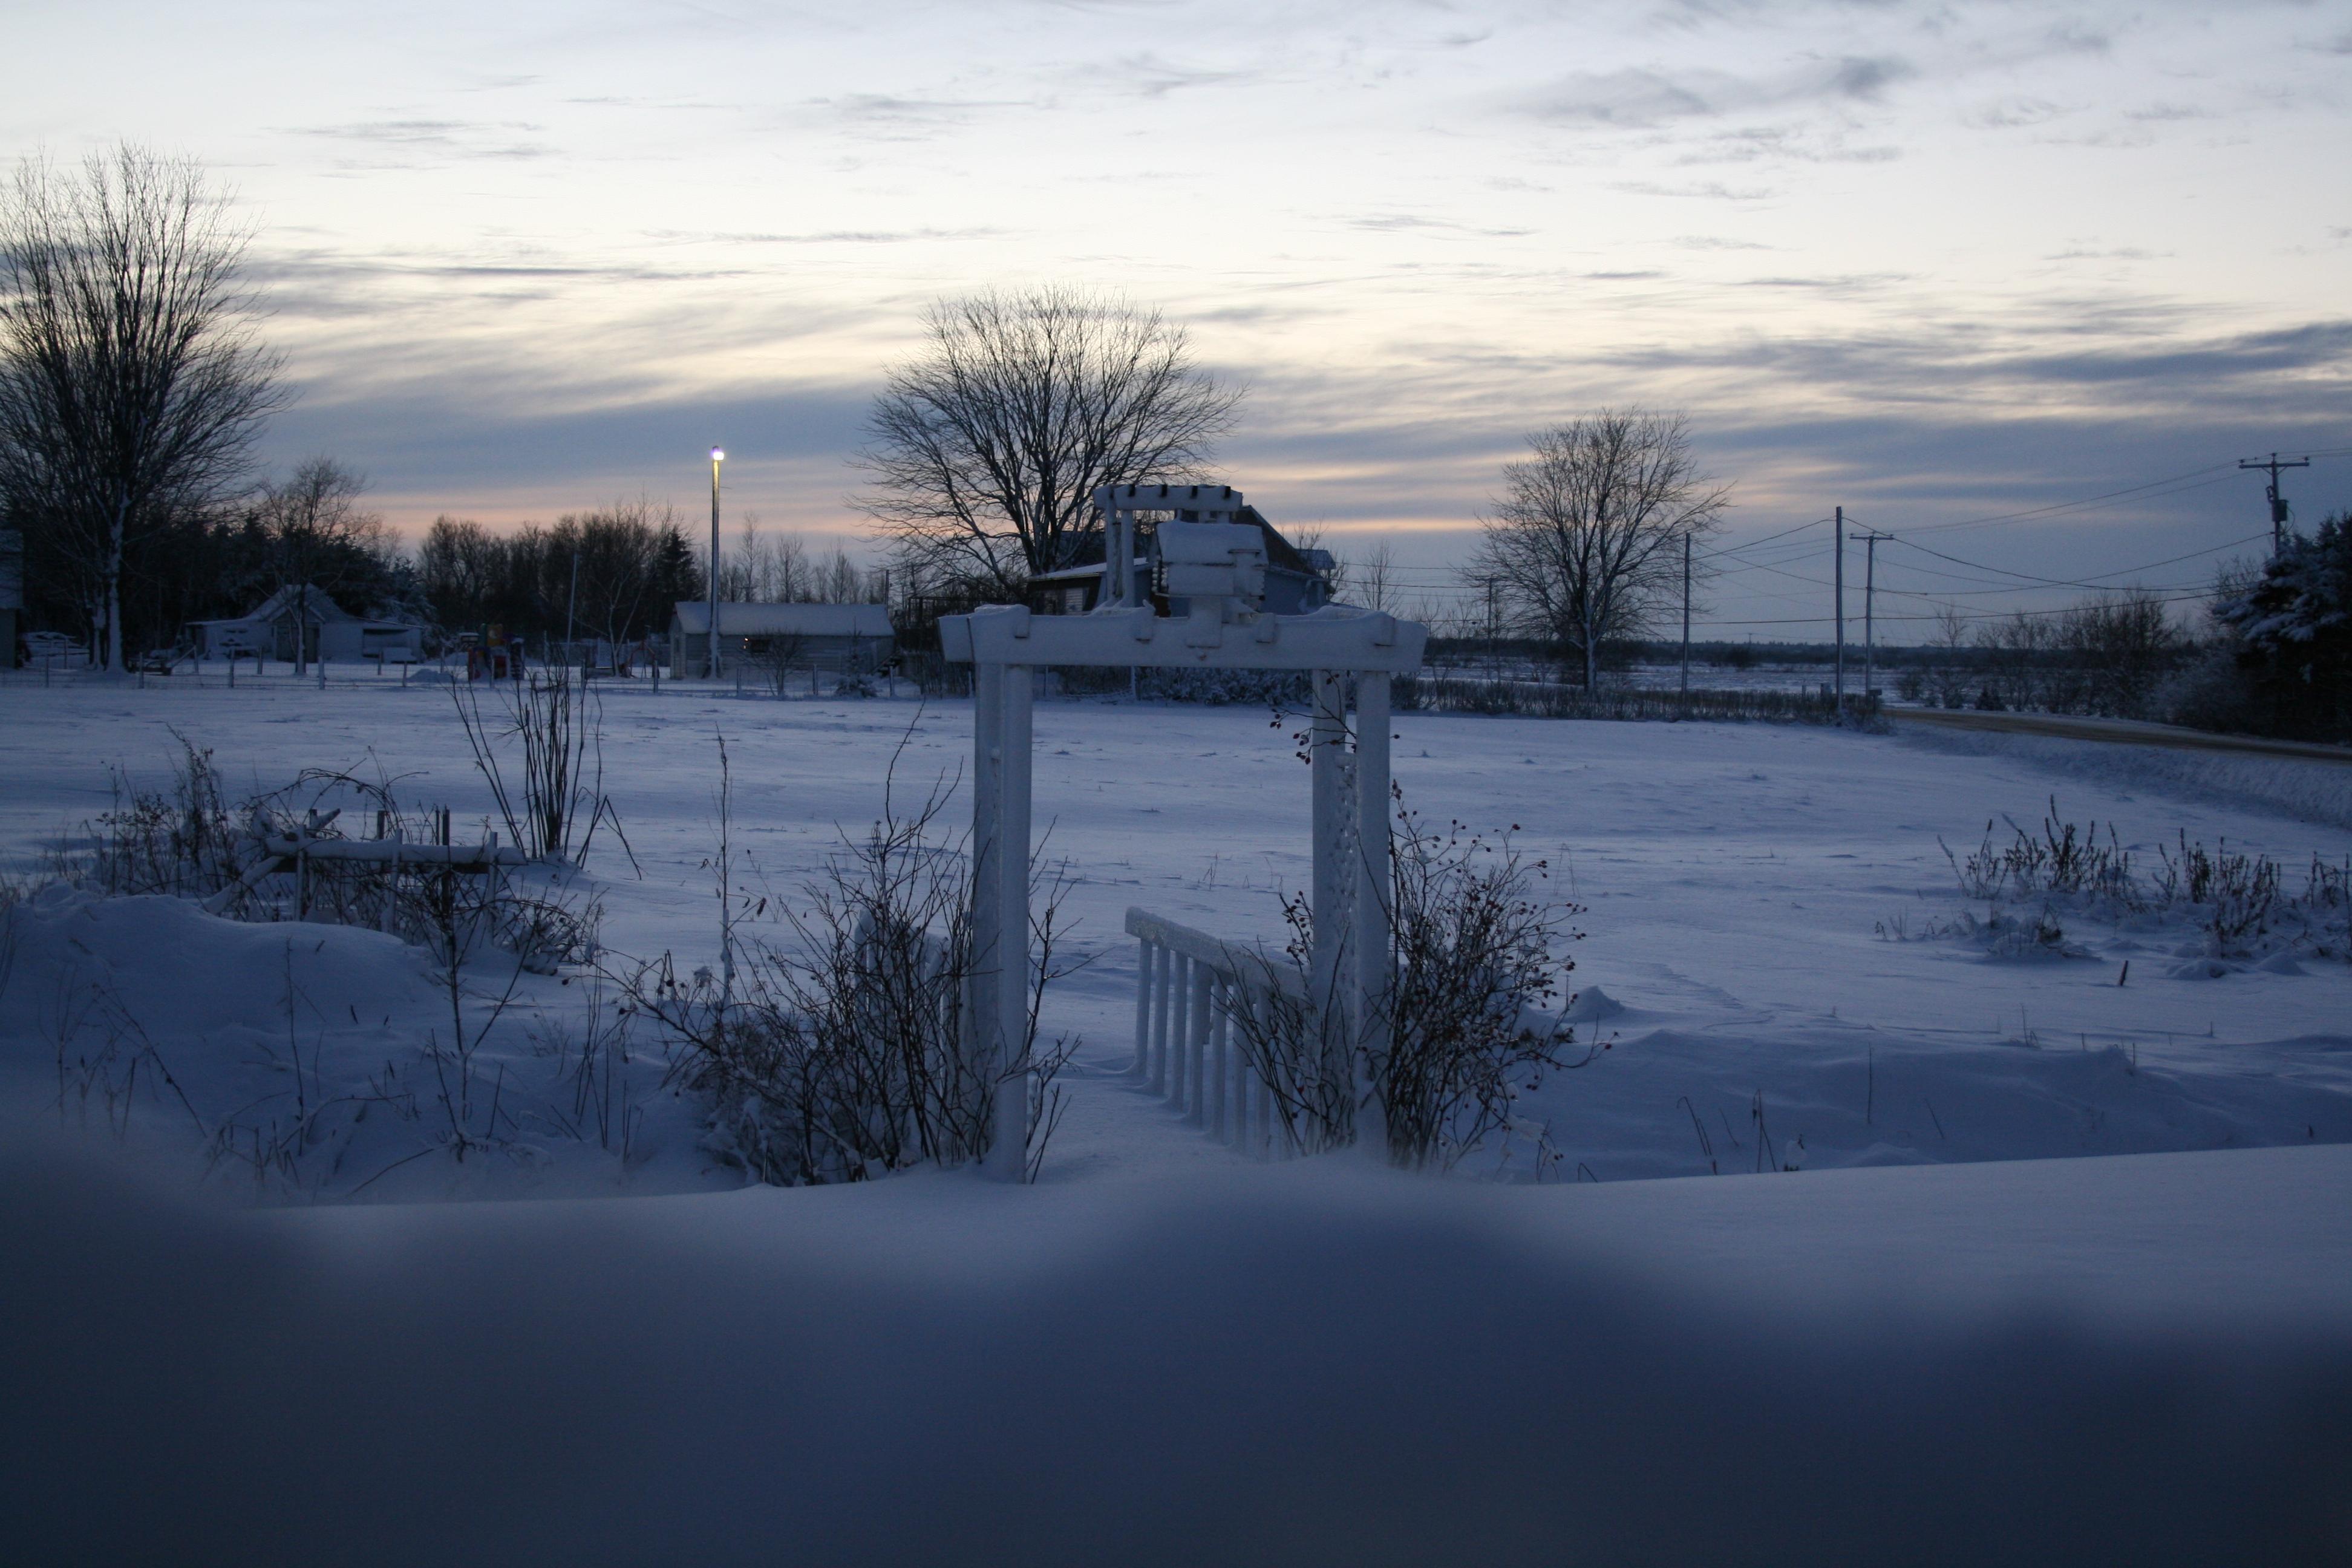 bozzit garden field snow covered winter cold white nature